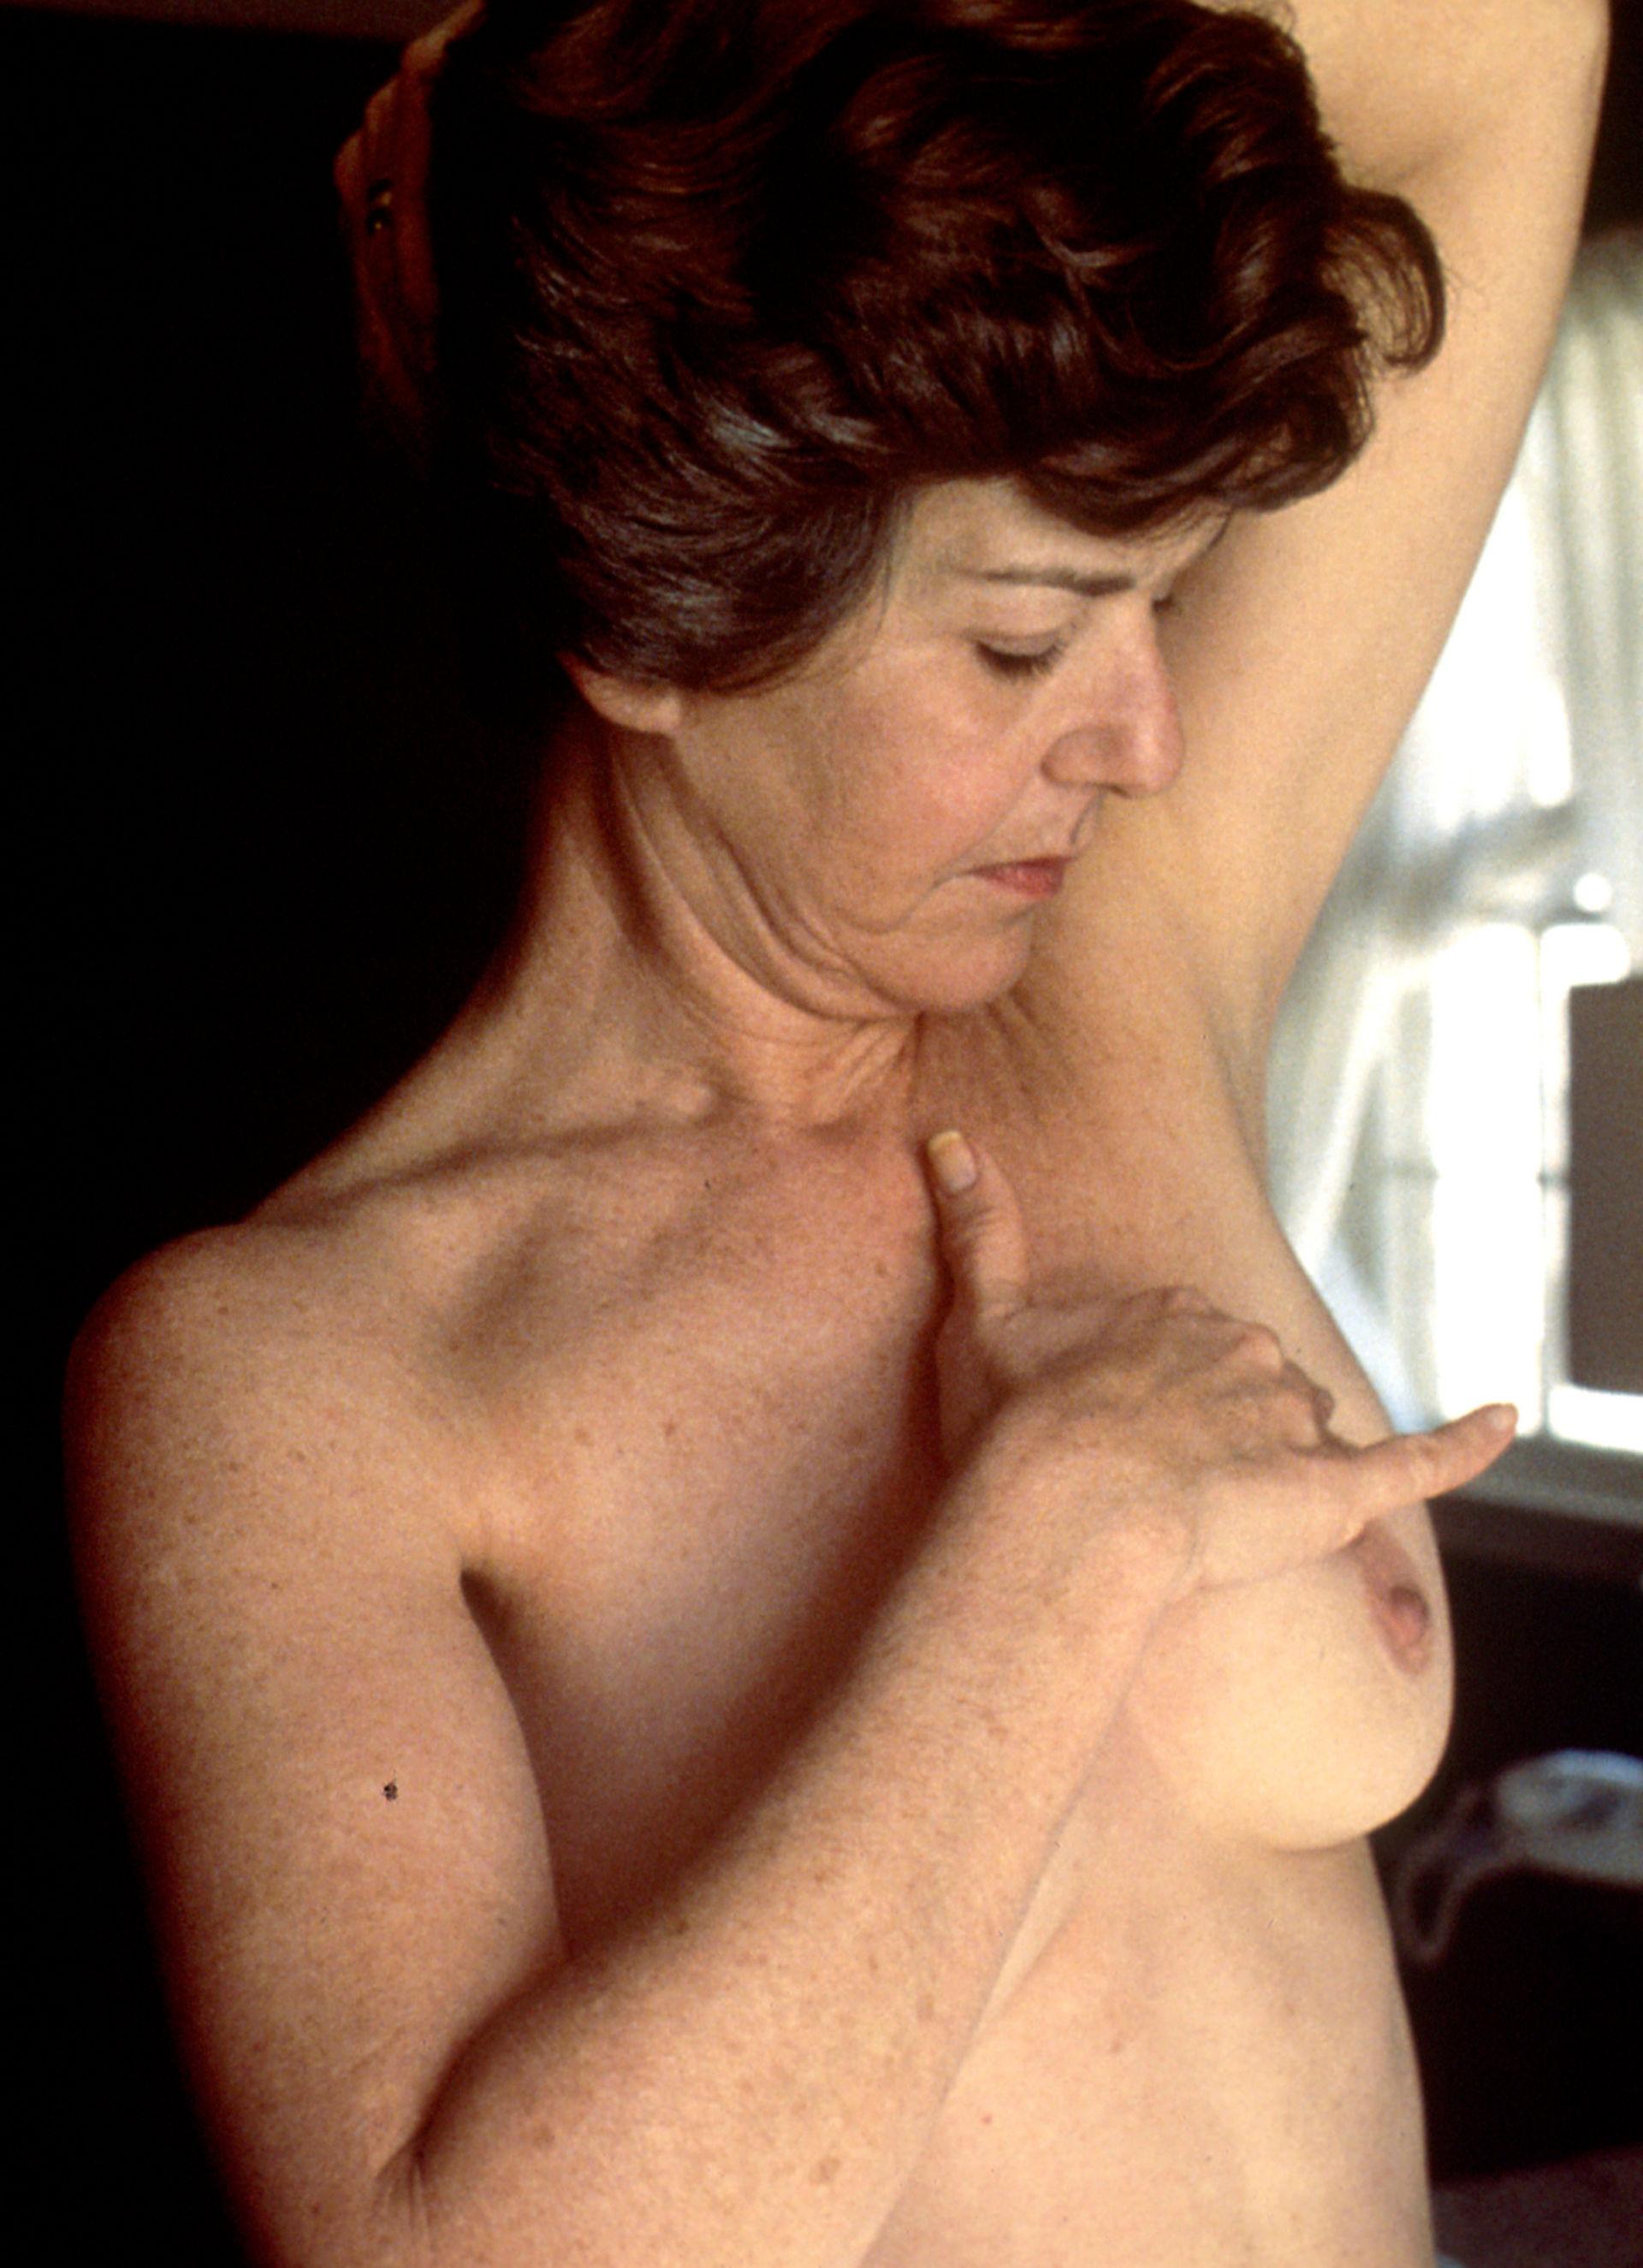 Breast cancer screening - self examination